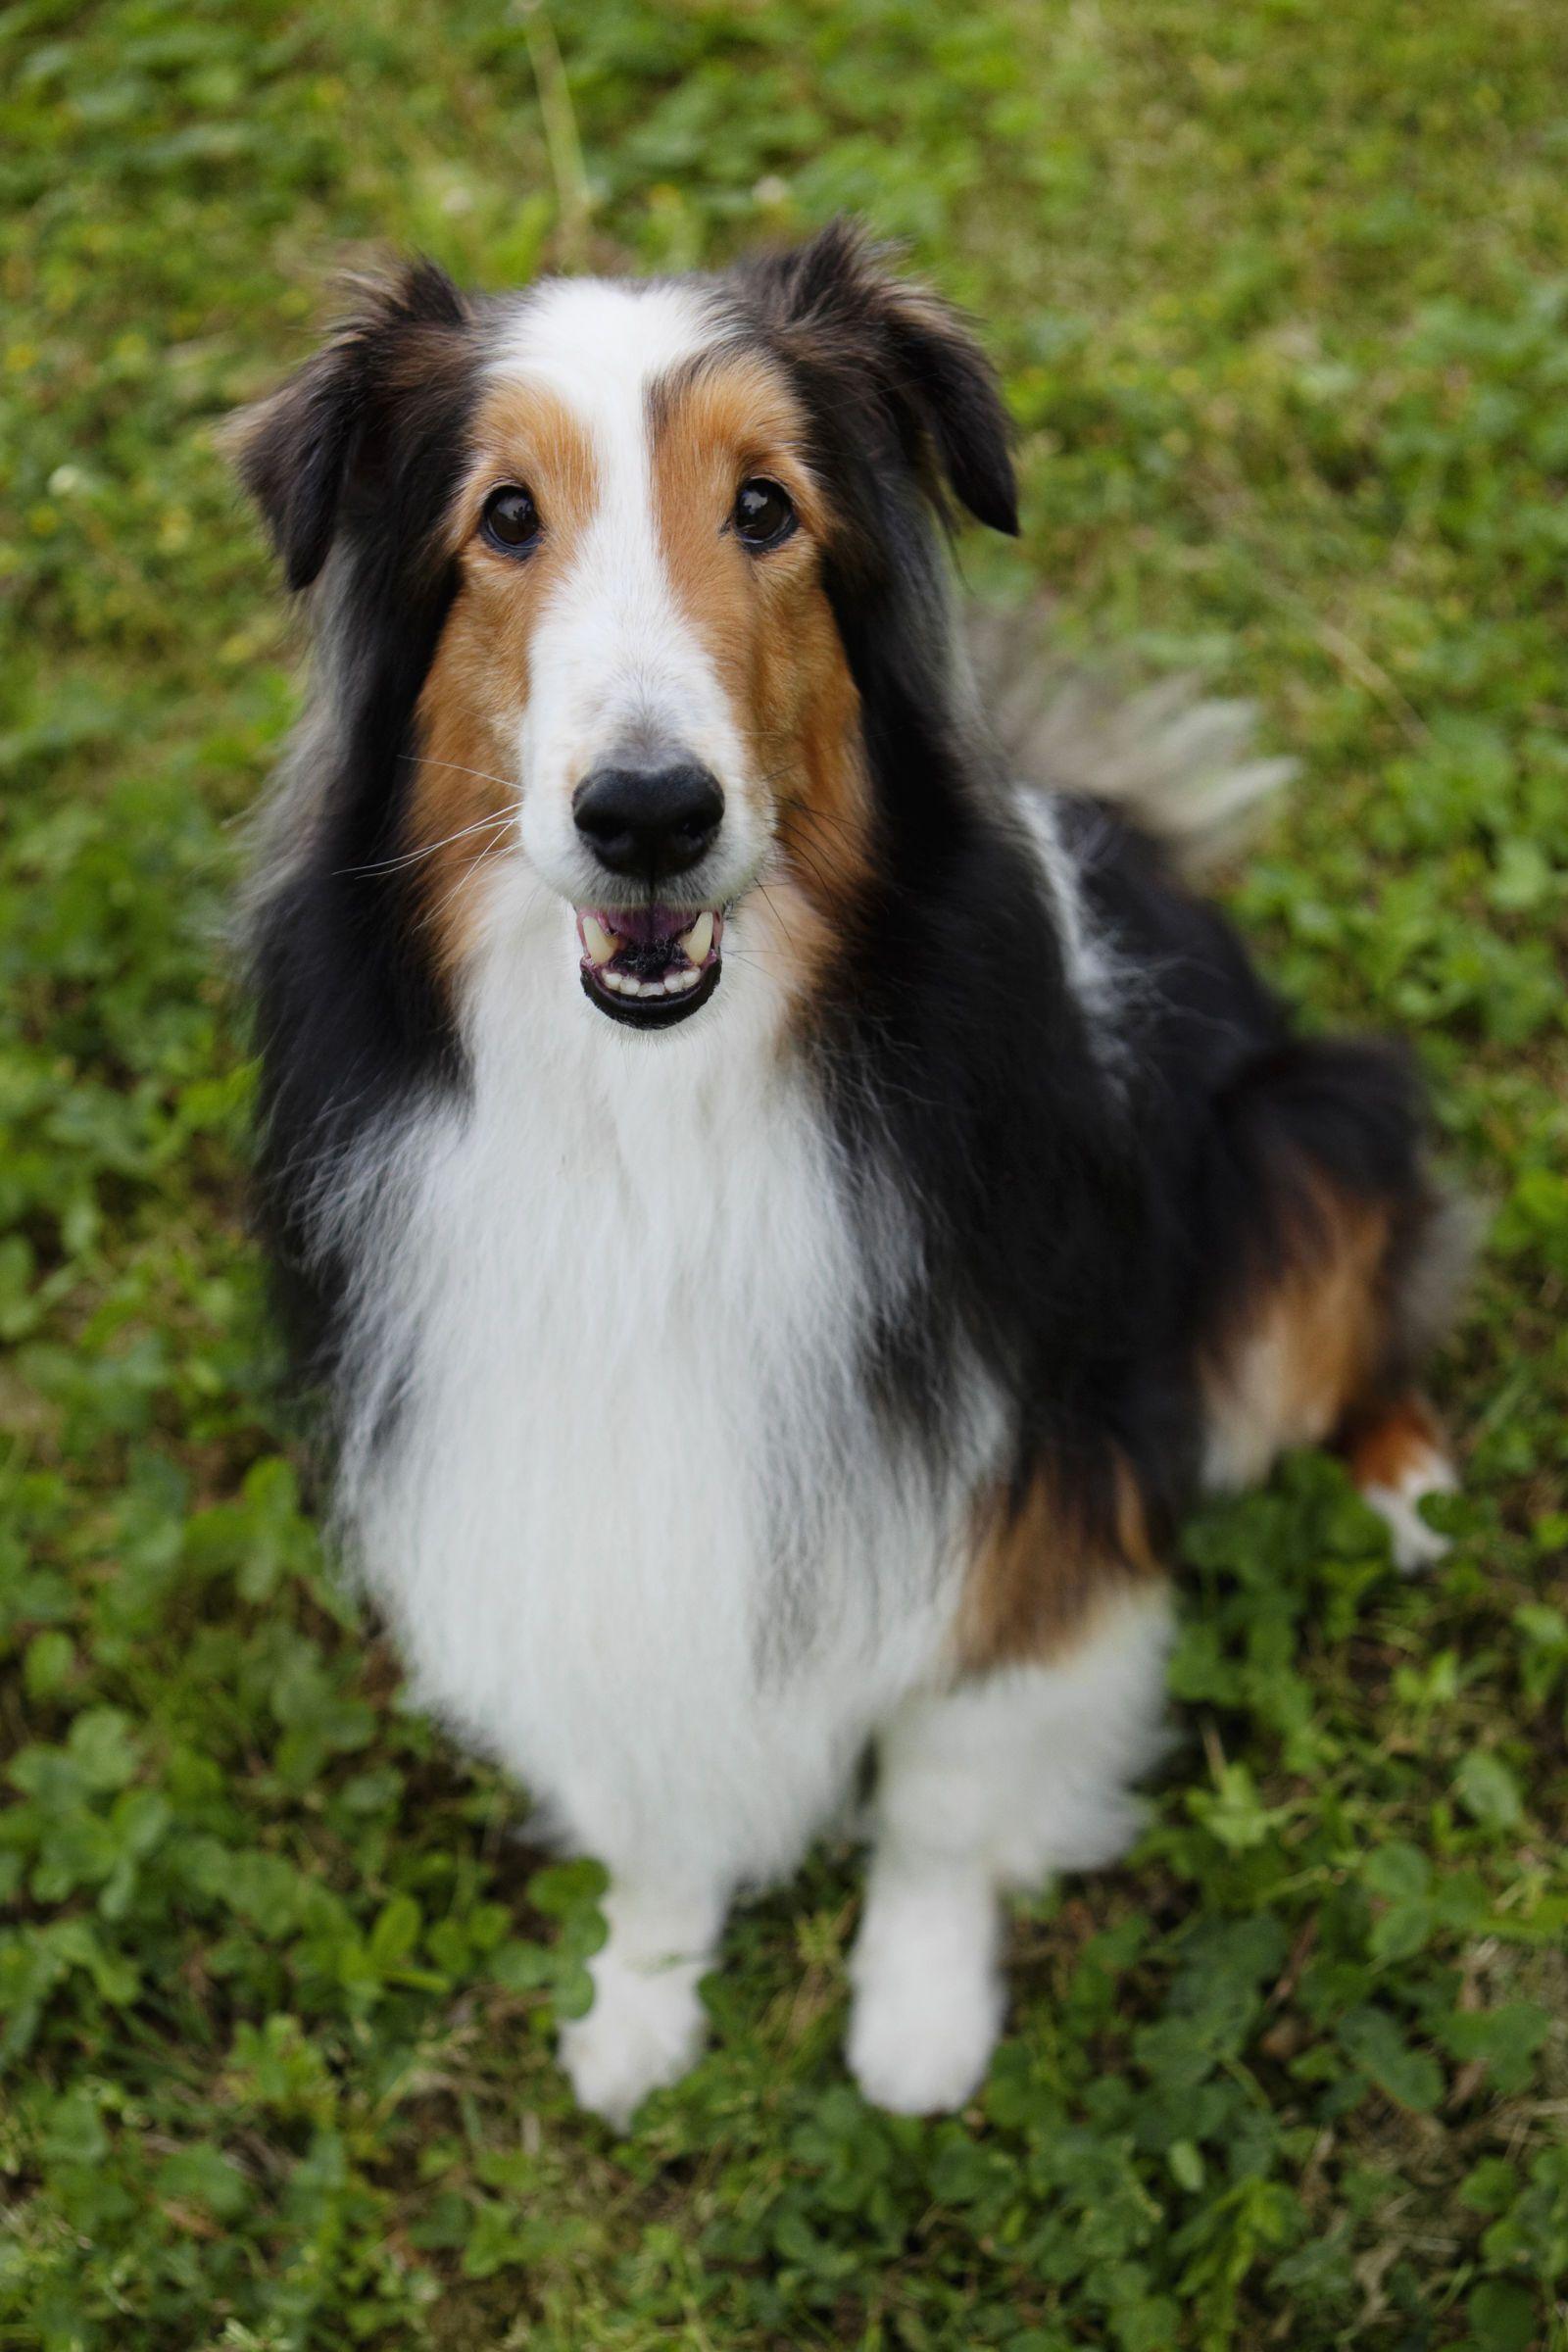 100 Unique Dog Names For Every Kind Of Pup Sheep Dog Puppy Shetland Sheepdog Dog Breeds